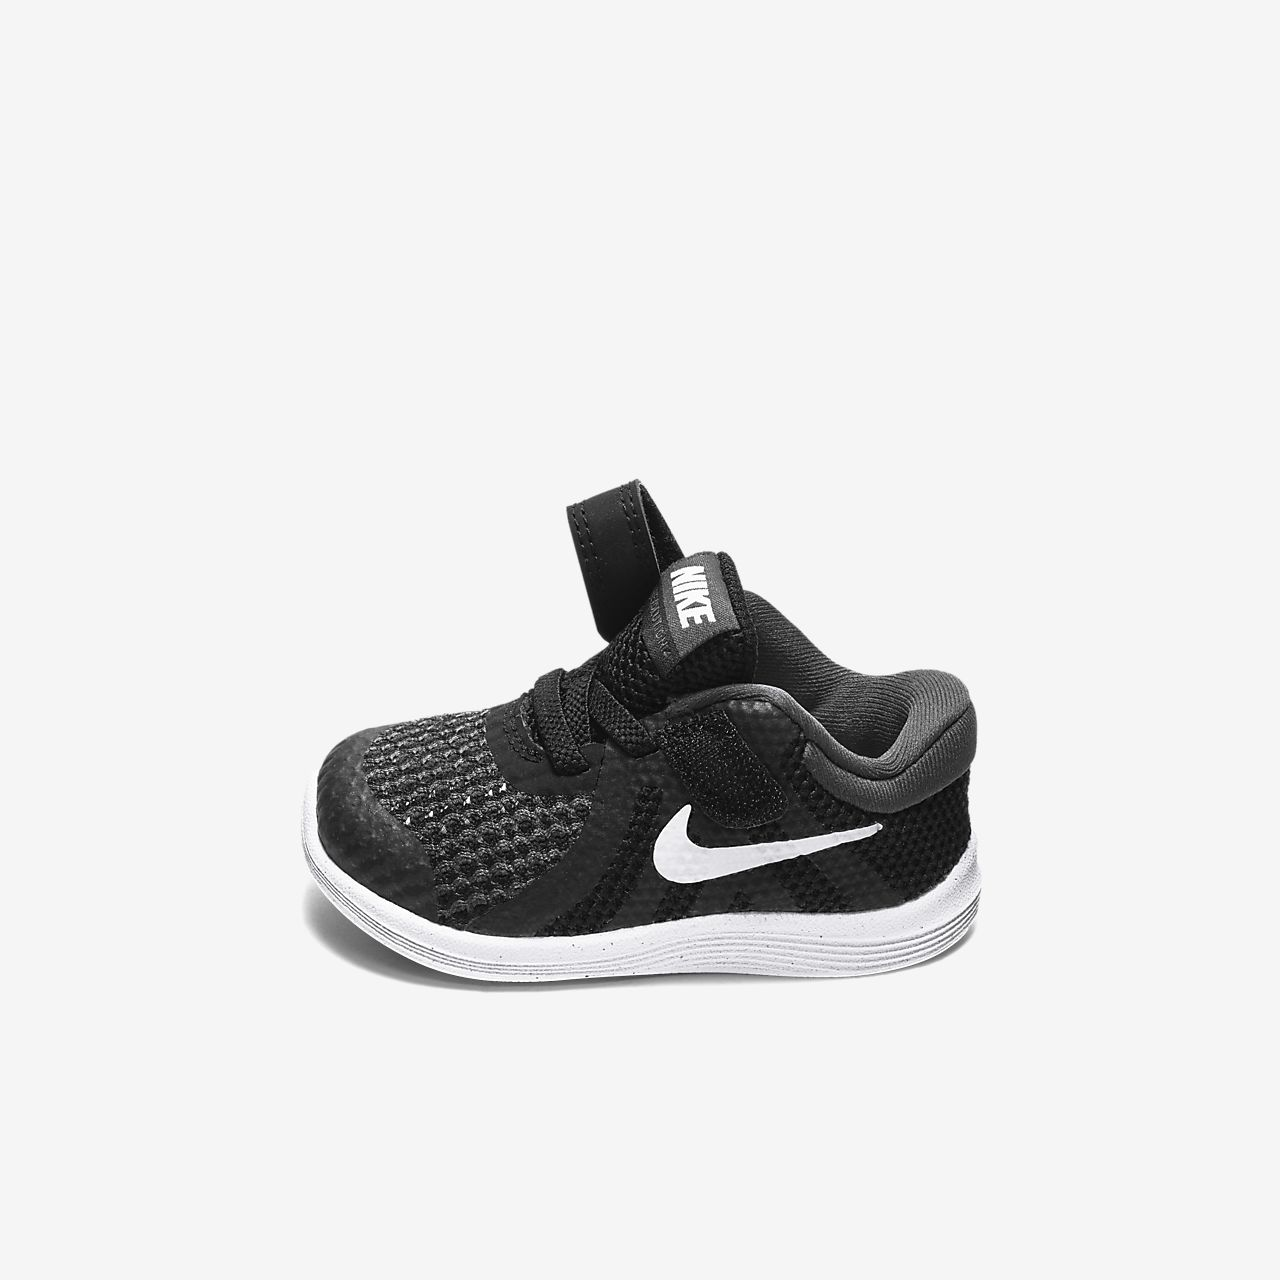 6401ed7a1dd Nike Revolution 4 Schoen voor baby's/peuters. Nike.com NL